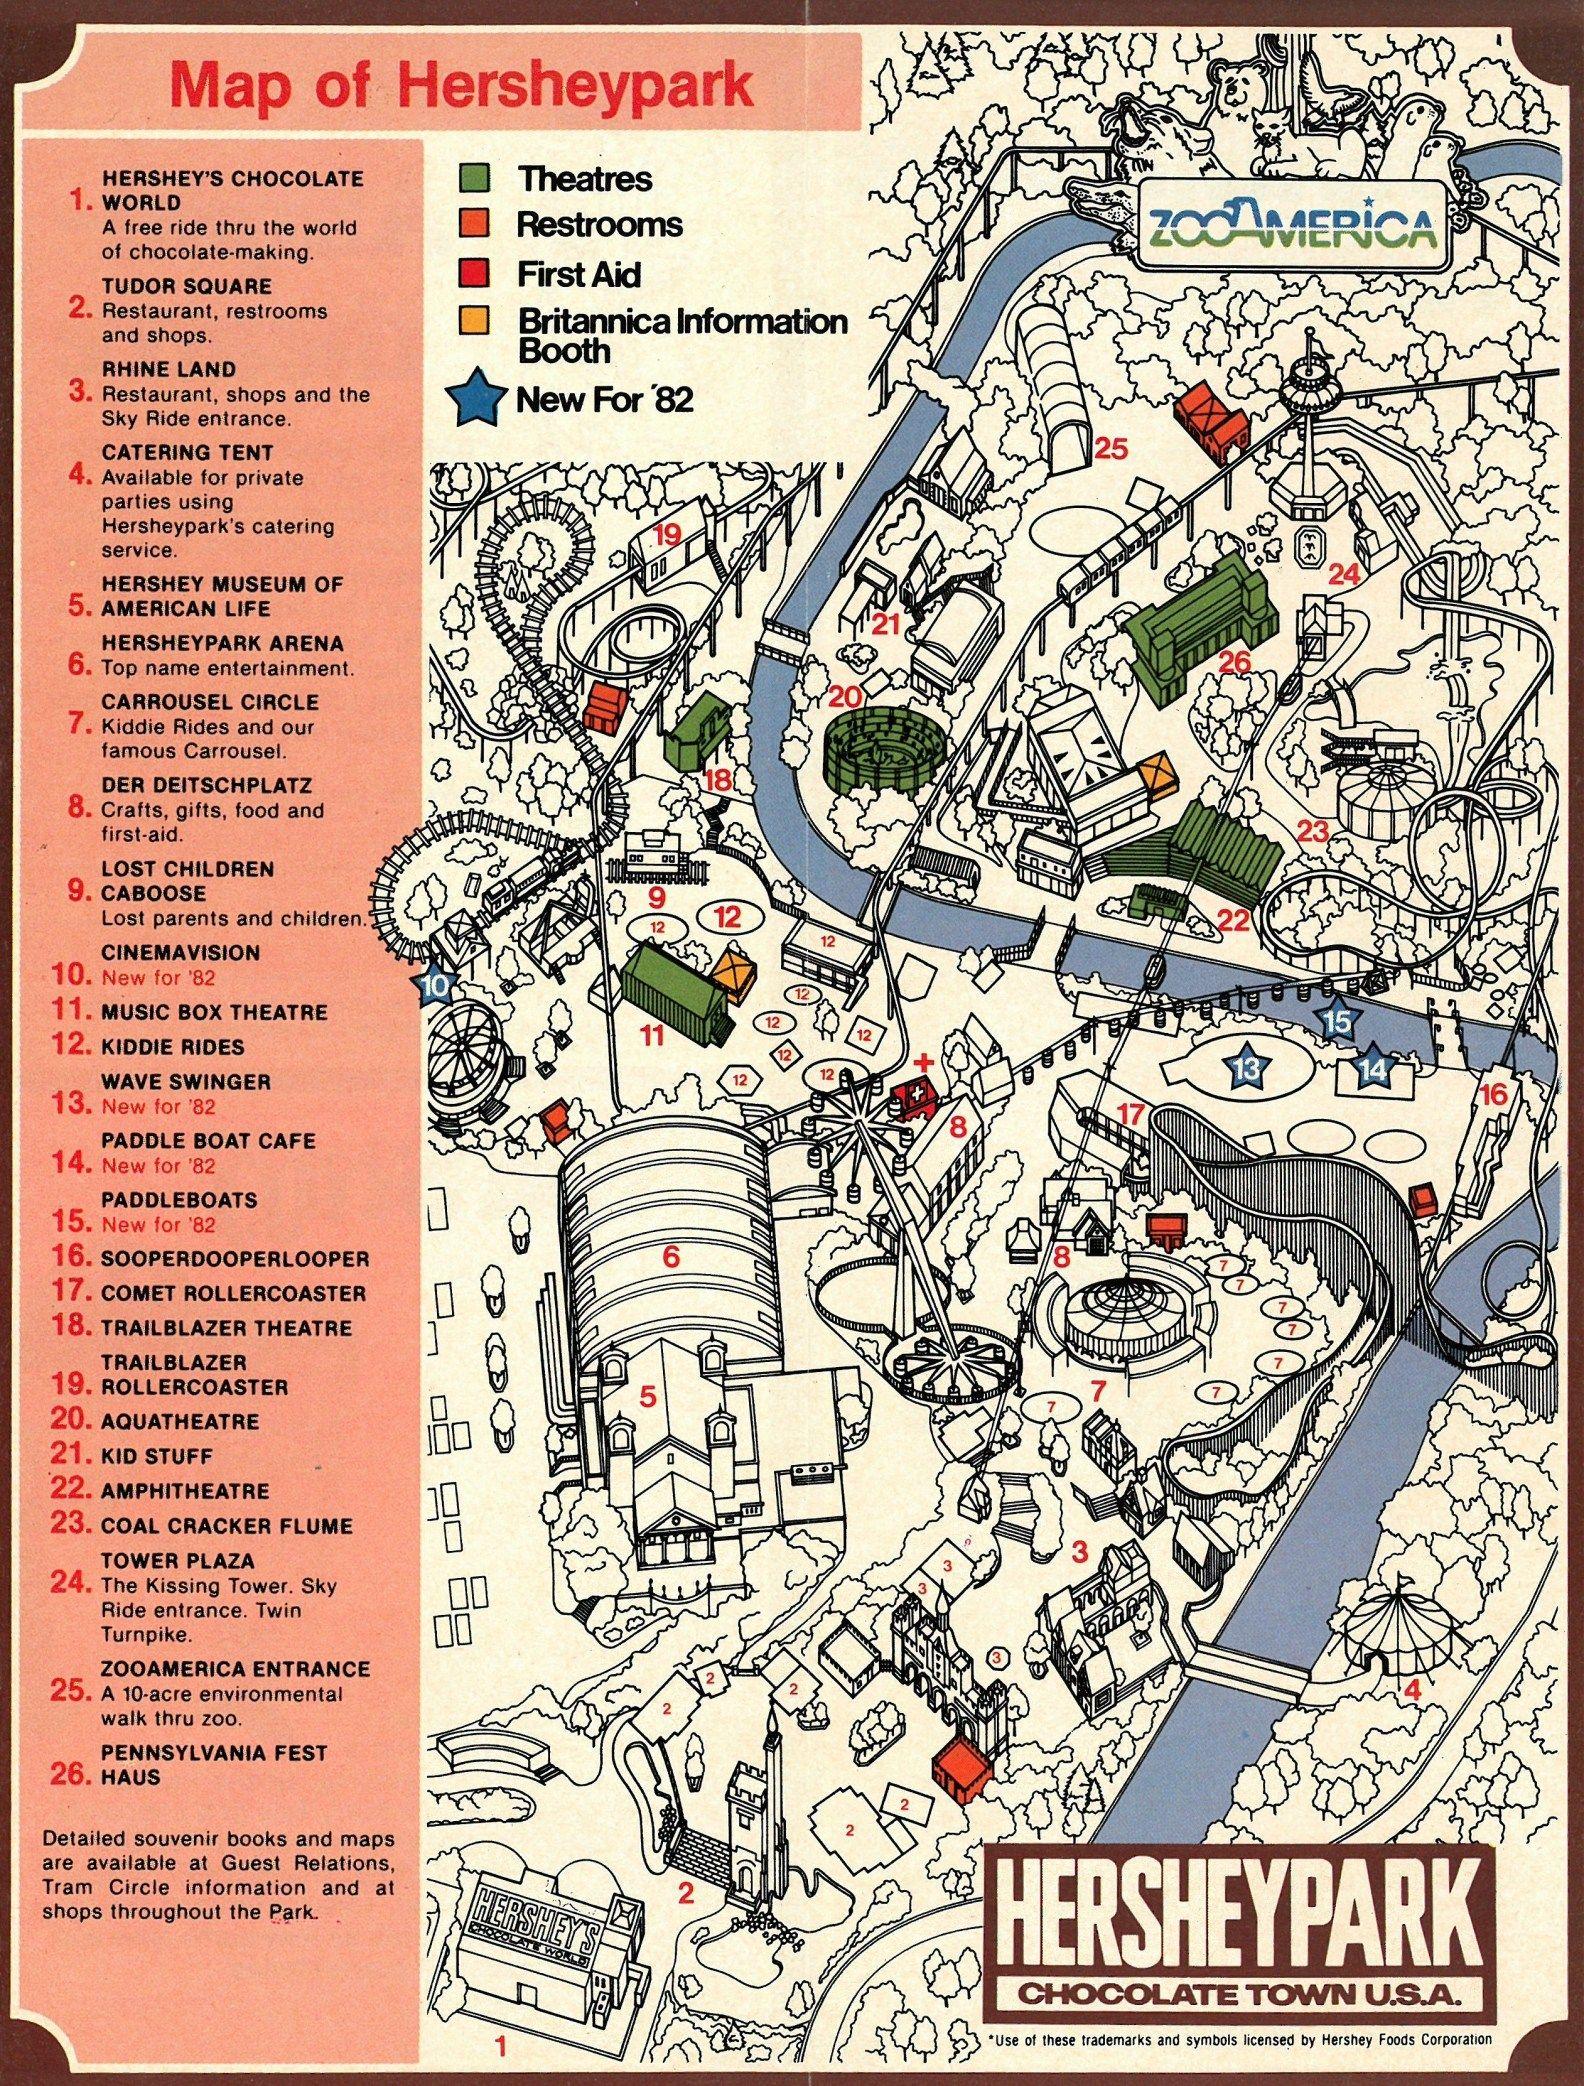 Hershey Park Maps : hershey, Amusement, Parkives, Amusement,, Hershey, Park,